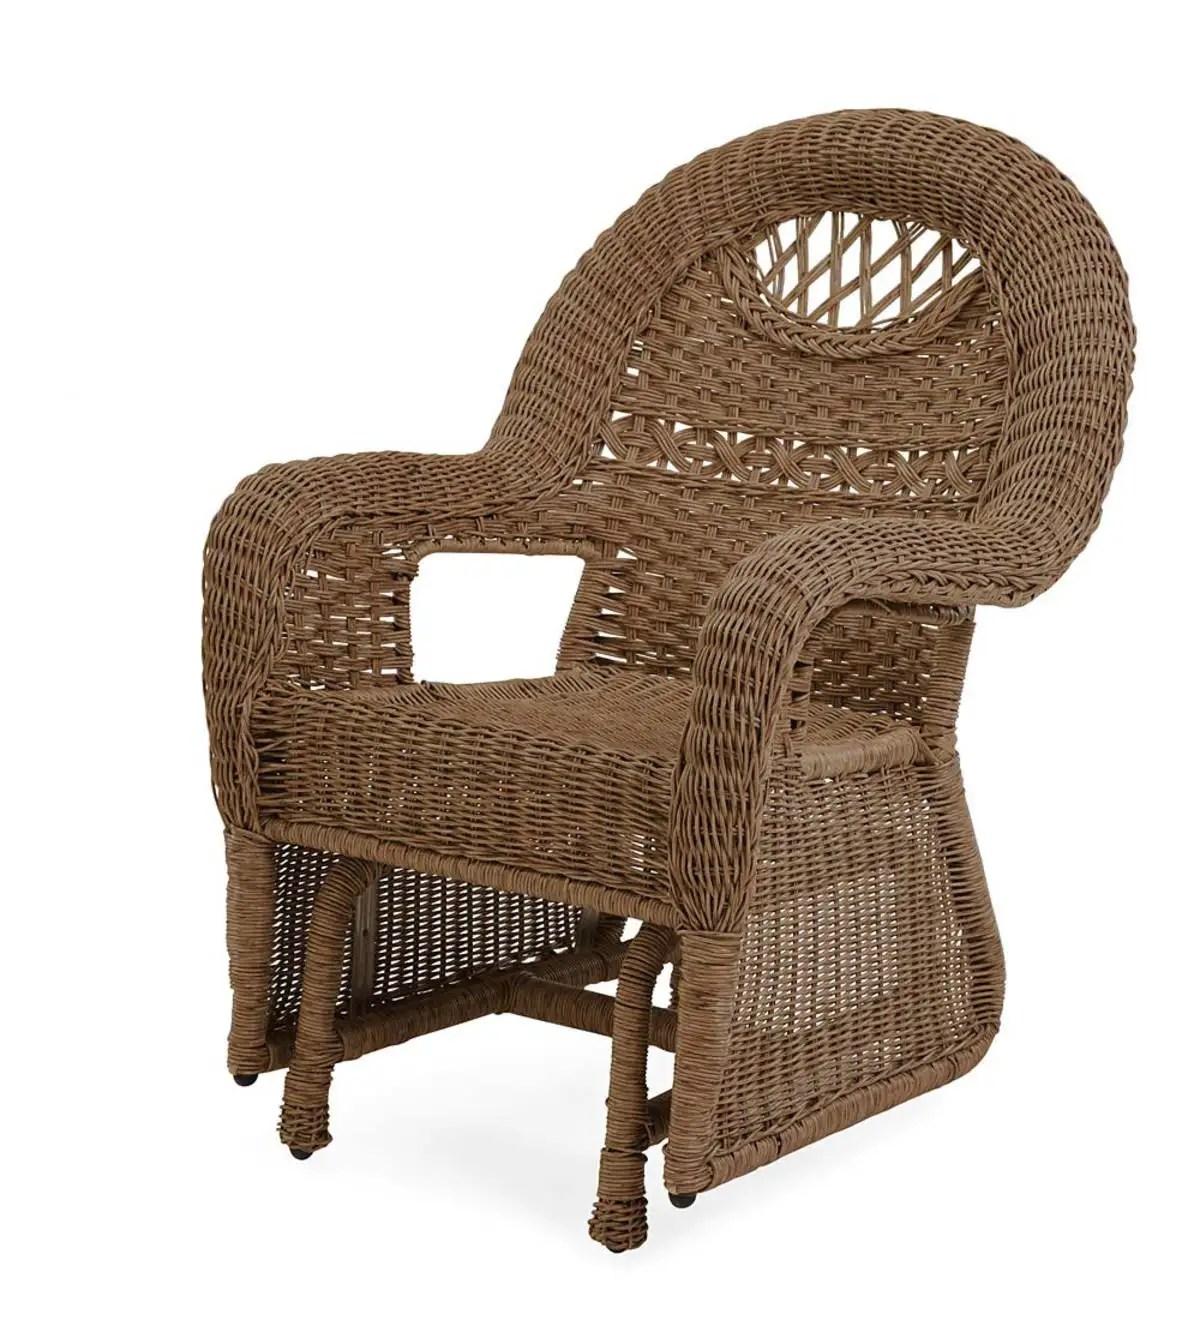 prospect hill wicker chair glider beach house walnut plowhearth